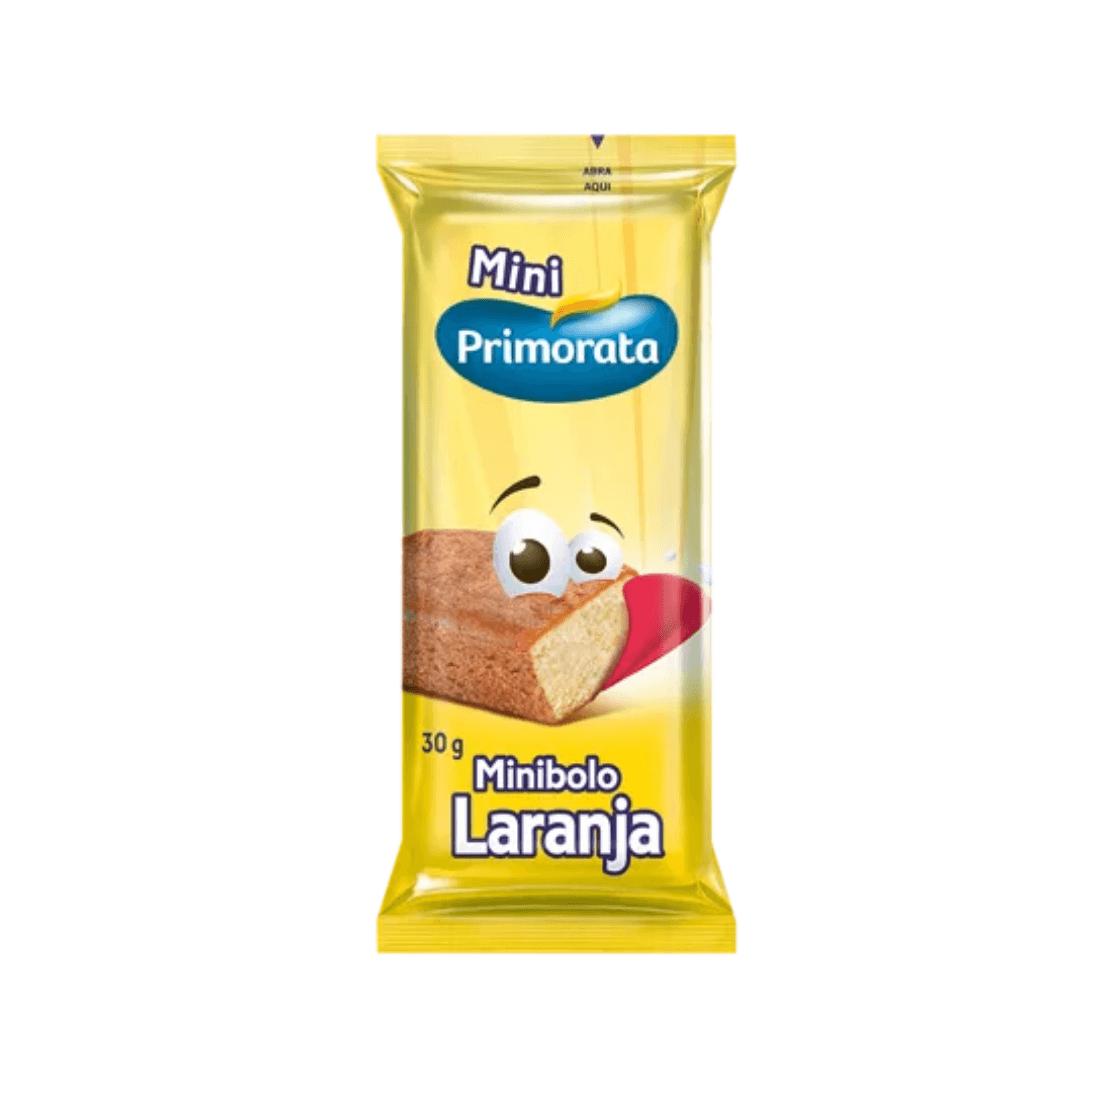 MINI BOLO LARANJA PRIMORATA 30G CAIXA 18 UNIDADES